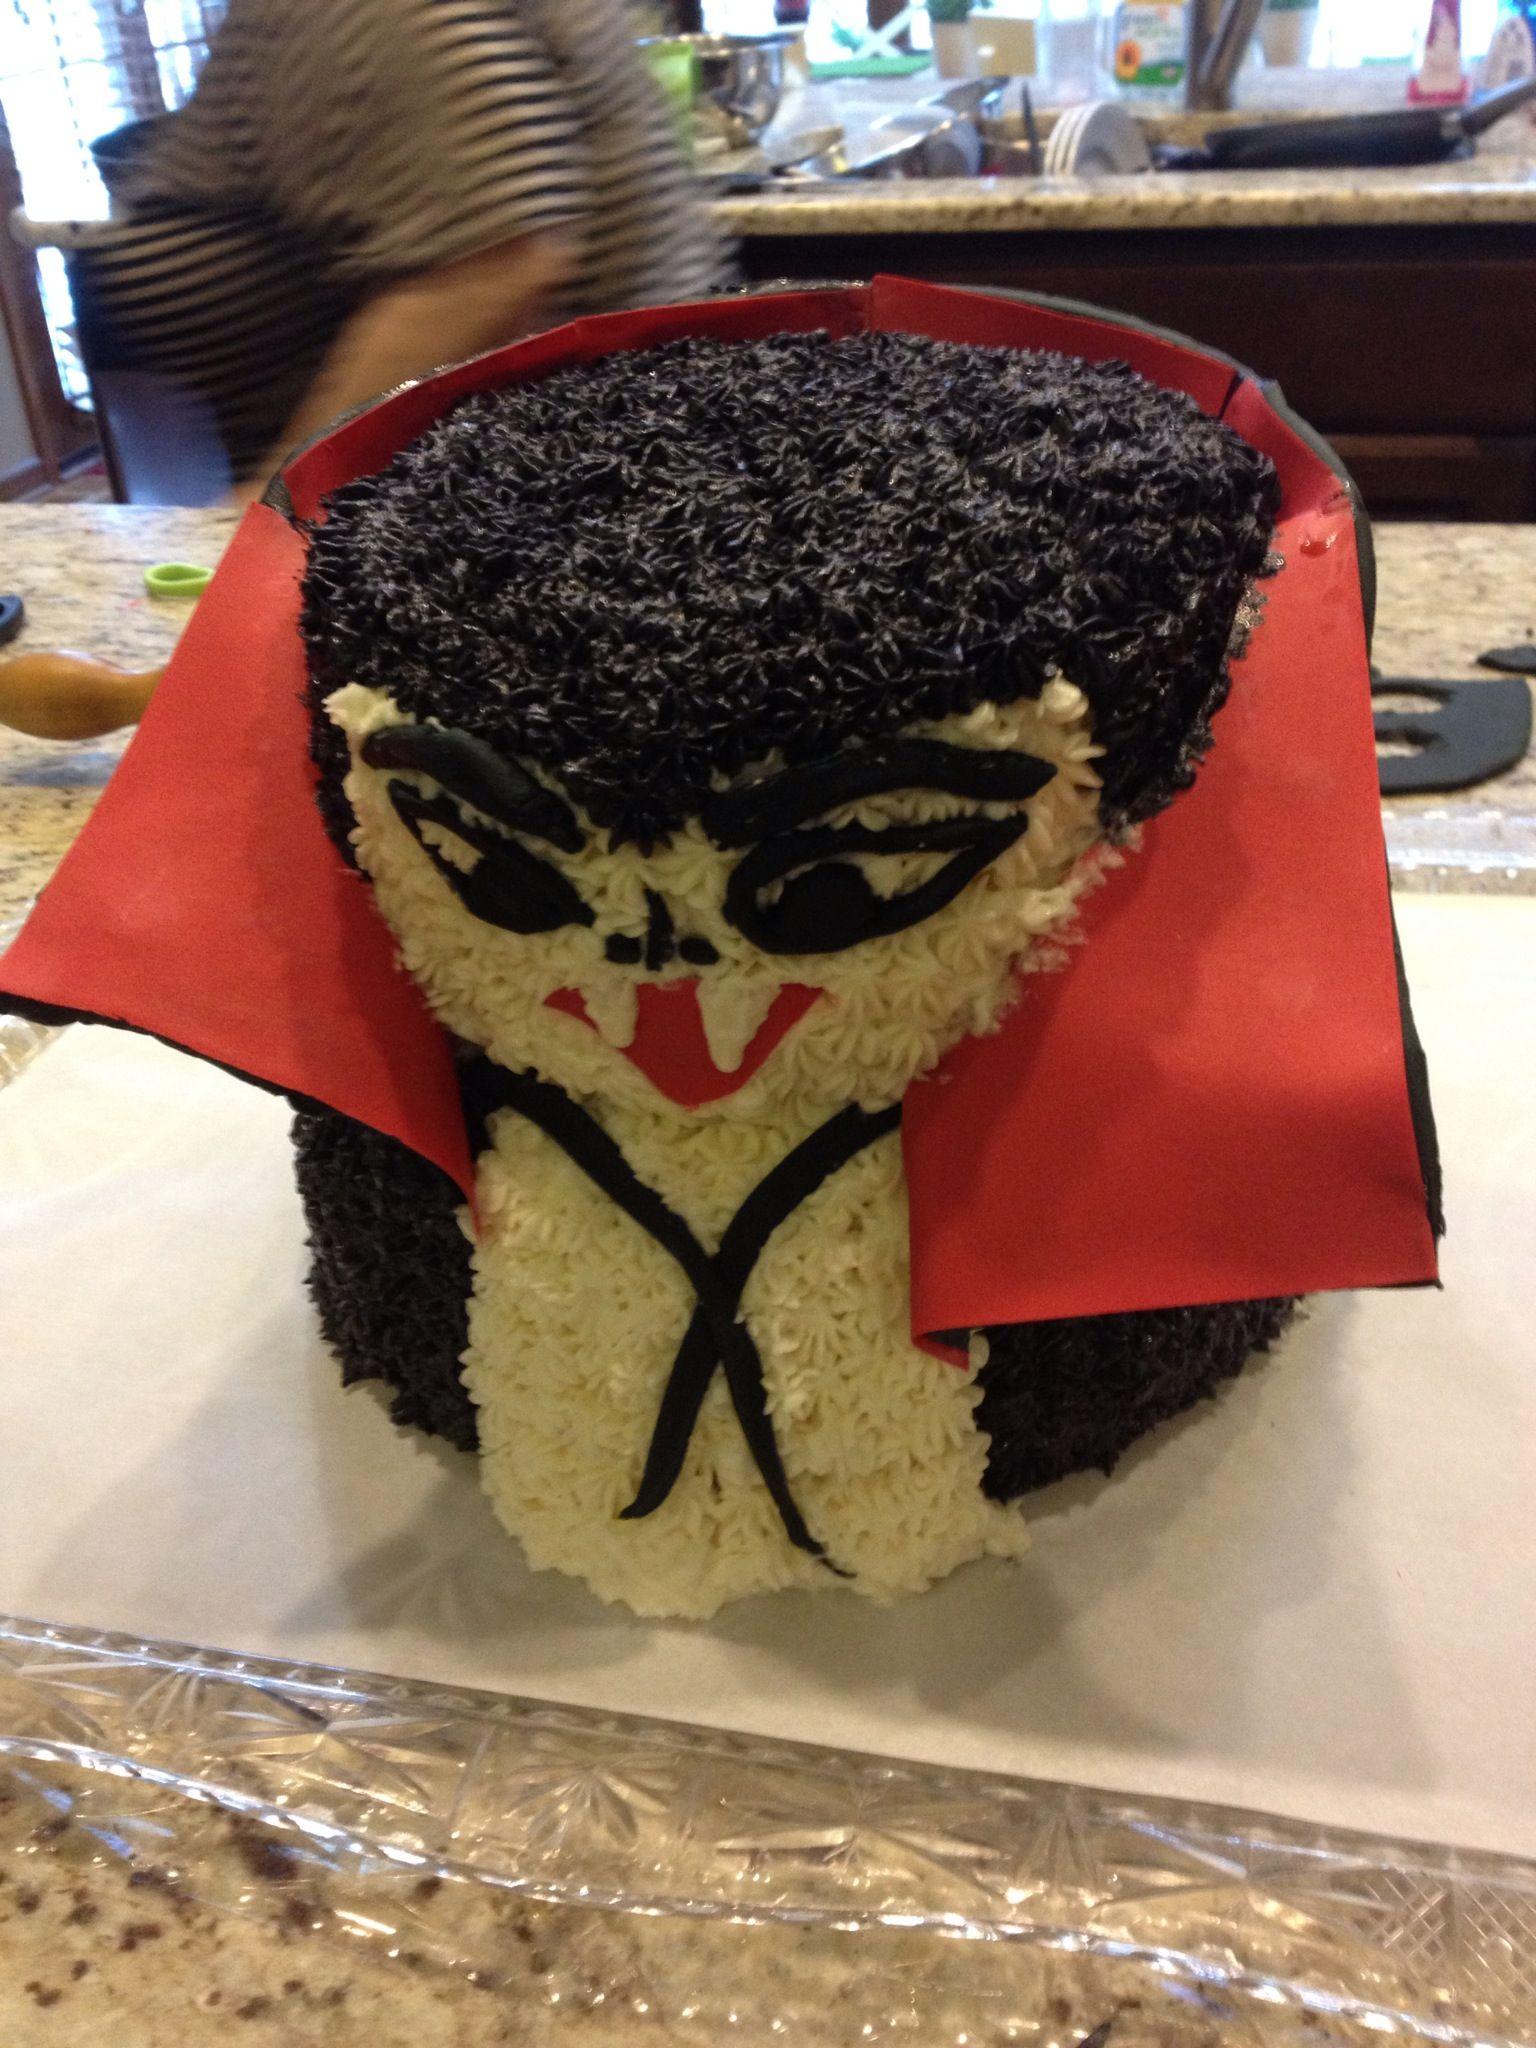 Hotel Transylvania Dracula Cake